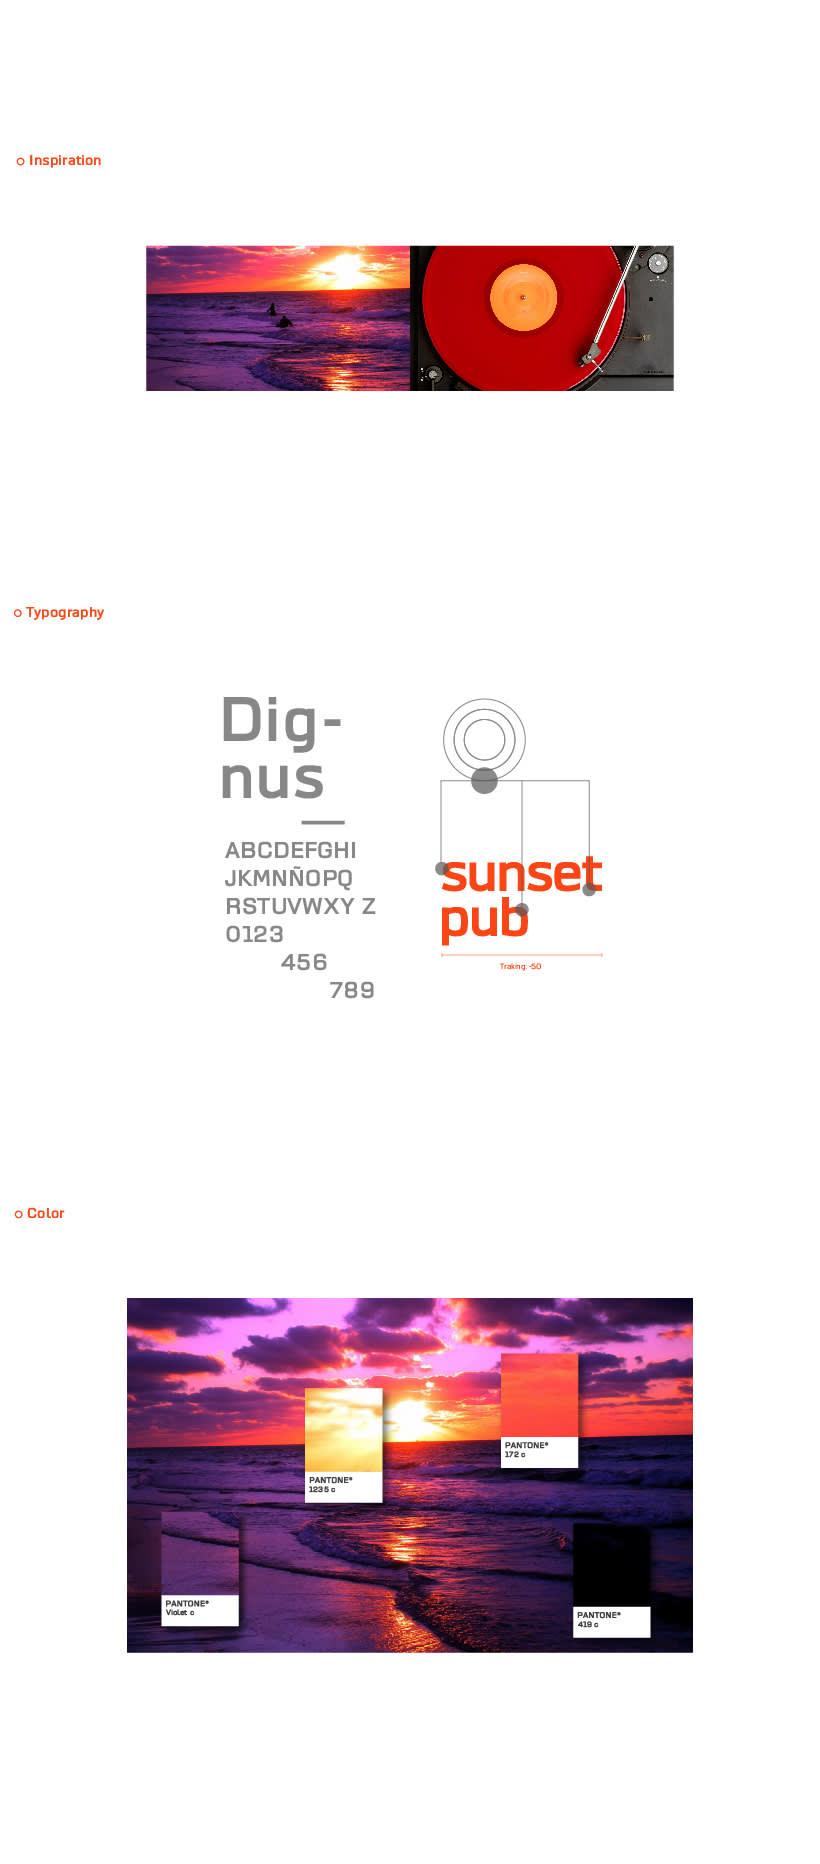 SUNSET PUB 2